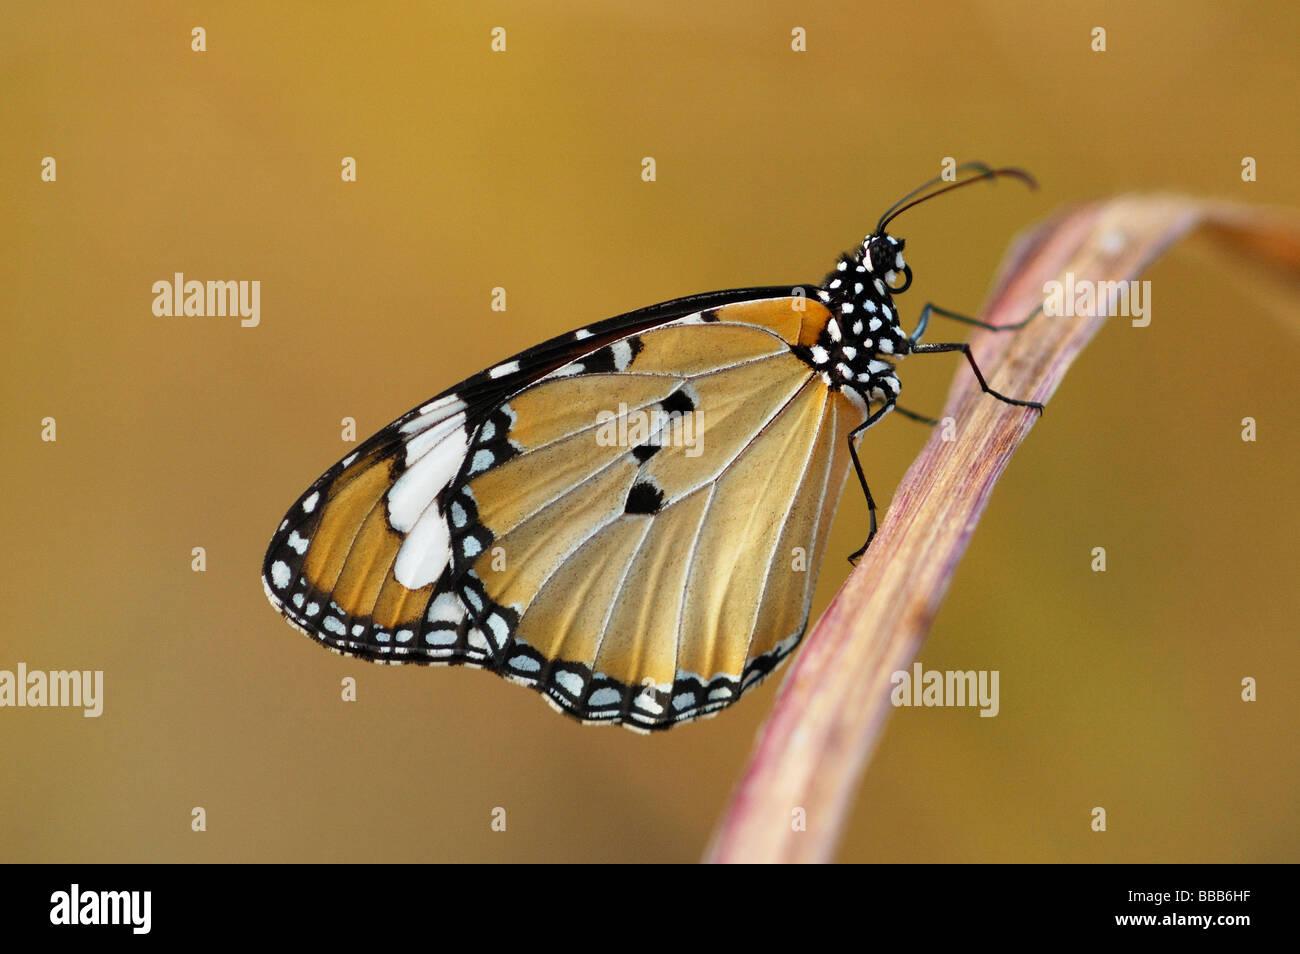 Llanura de mariposa Tigre (Danaus chrysippus) en la isla de Phi Phi, Tailandia Imagen De Stock